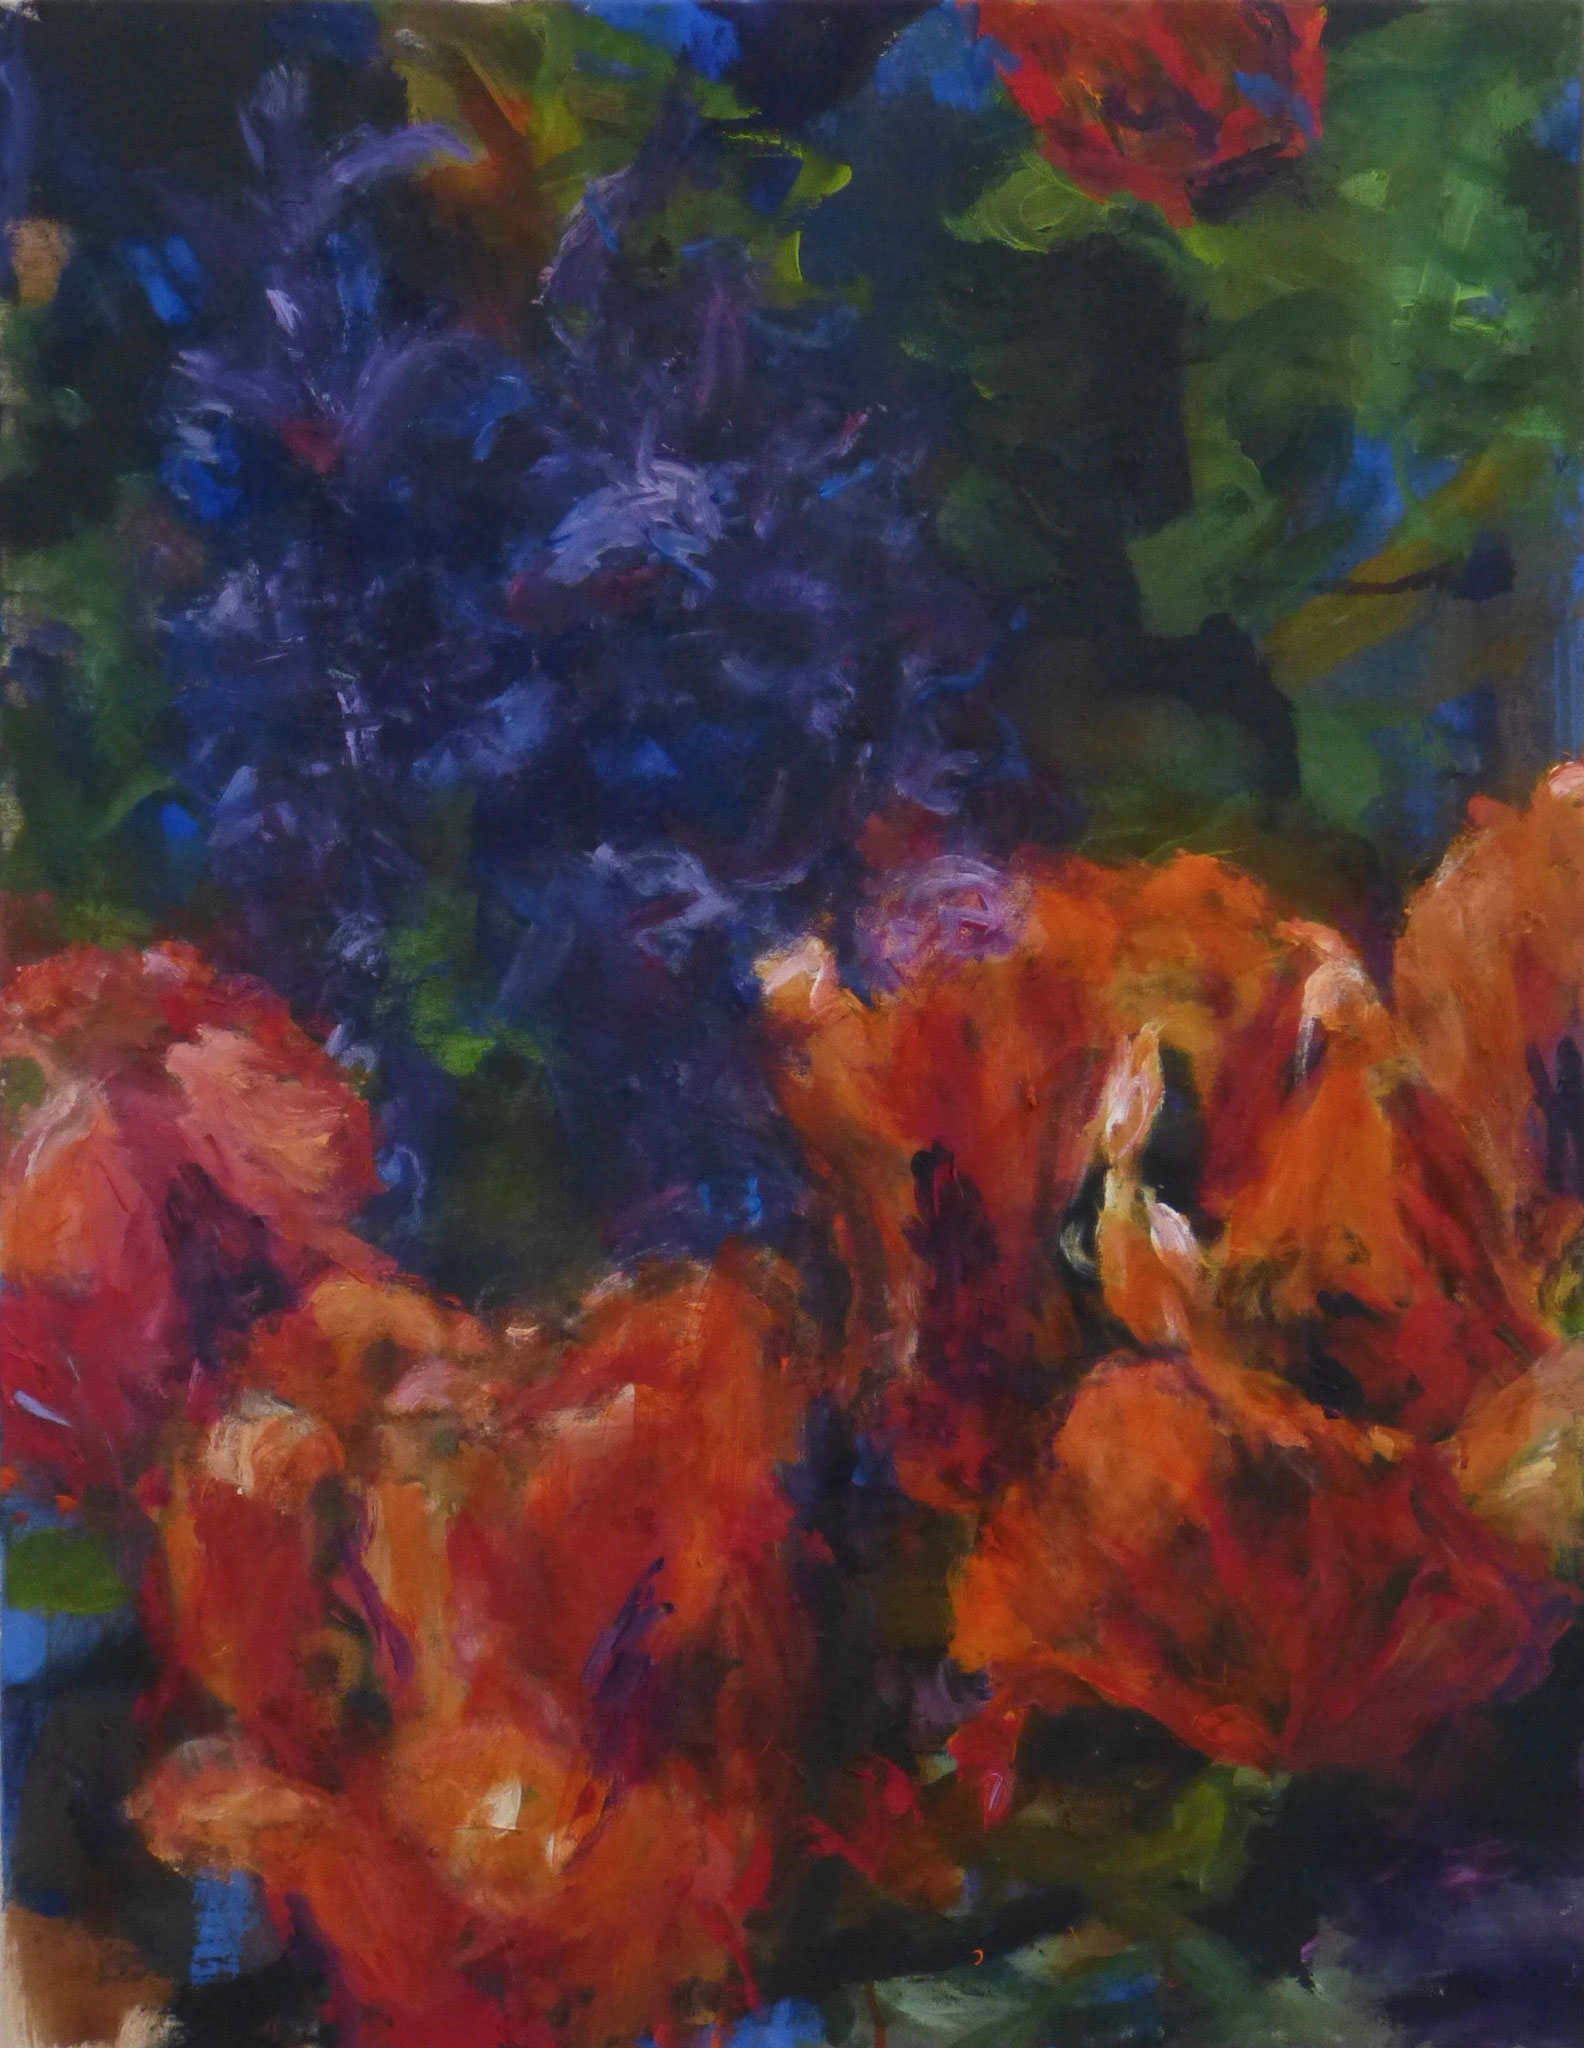 flower poem 12, Acryl/Leinwand, 90x70cm, 2017